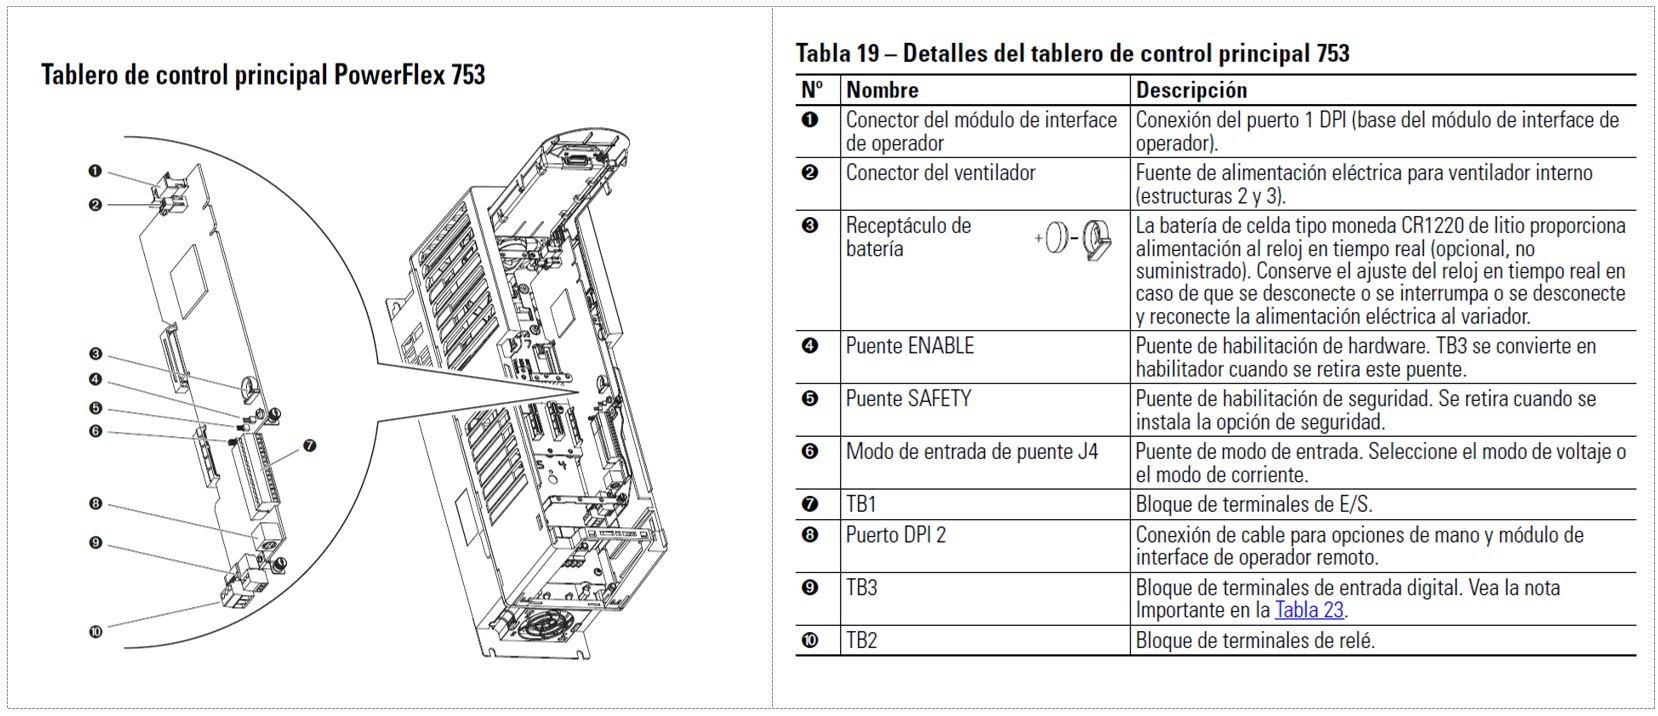 powerflex 753 wiring diagram 5 diferencias entre powerflex 753 y powerflex 755  powerflex 753 y powerflex 755